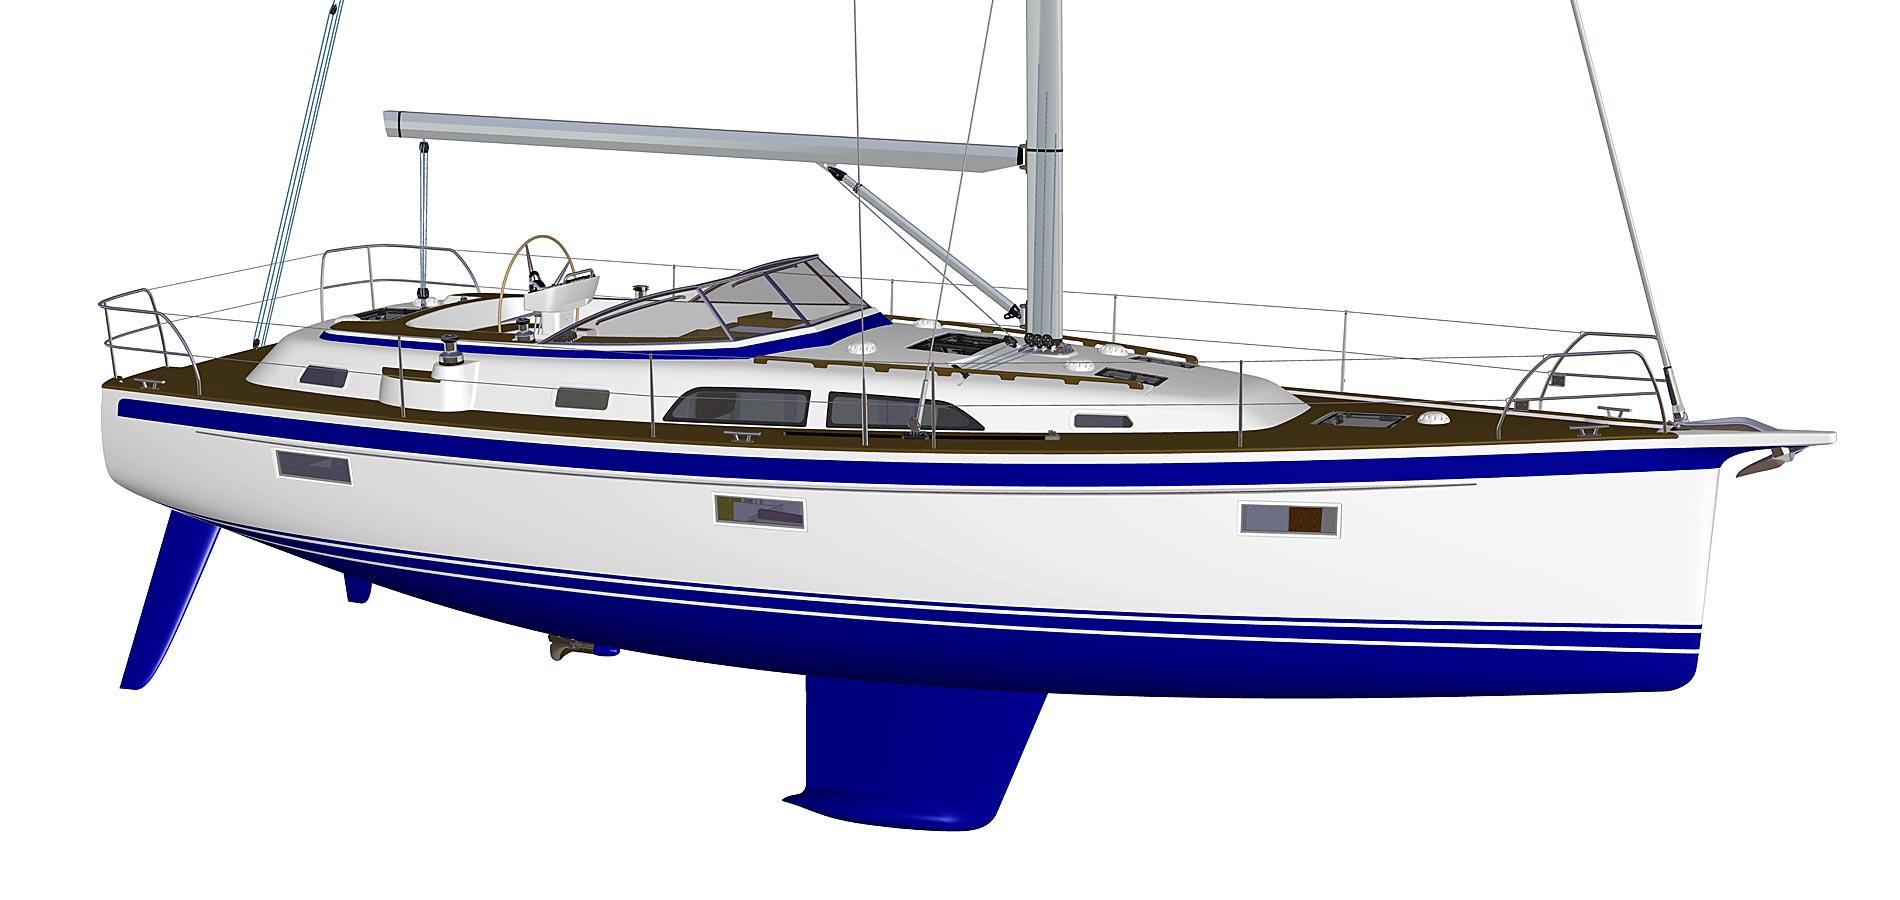 All-new model presented: Hallberg-Rassy 40C